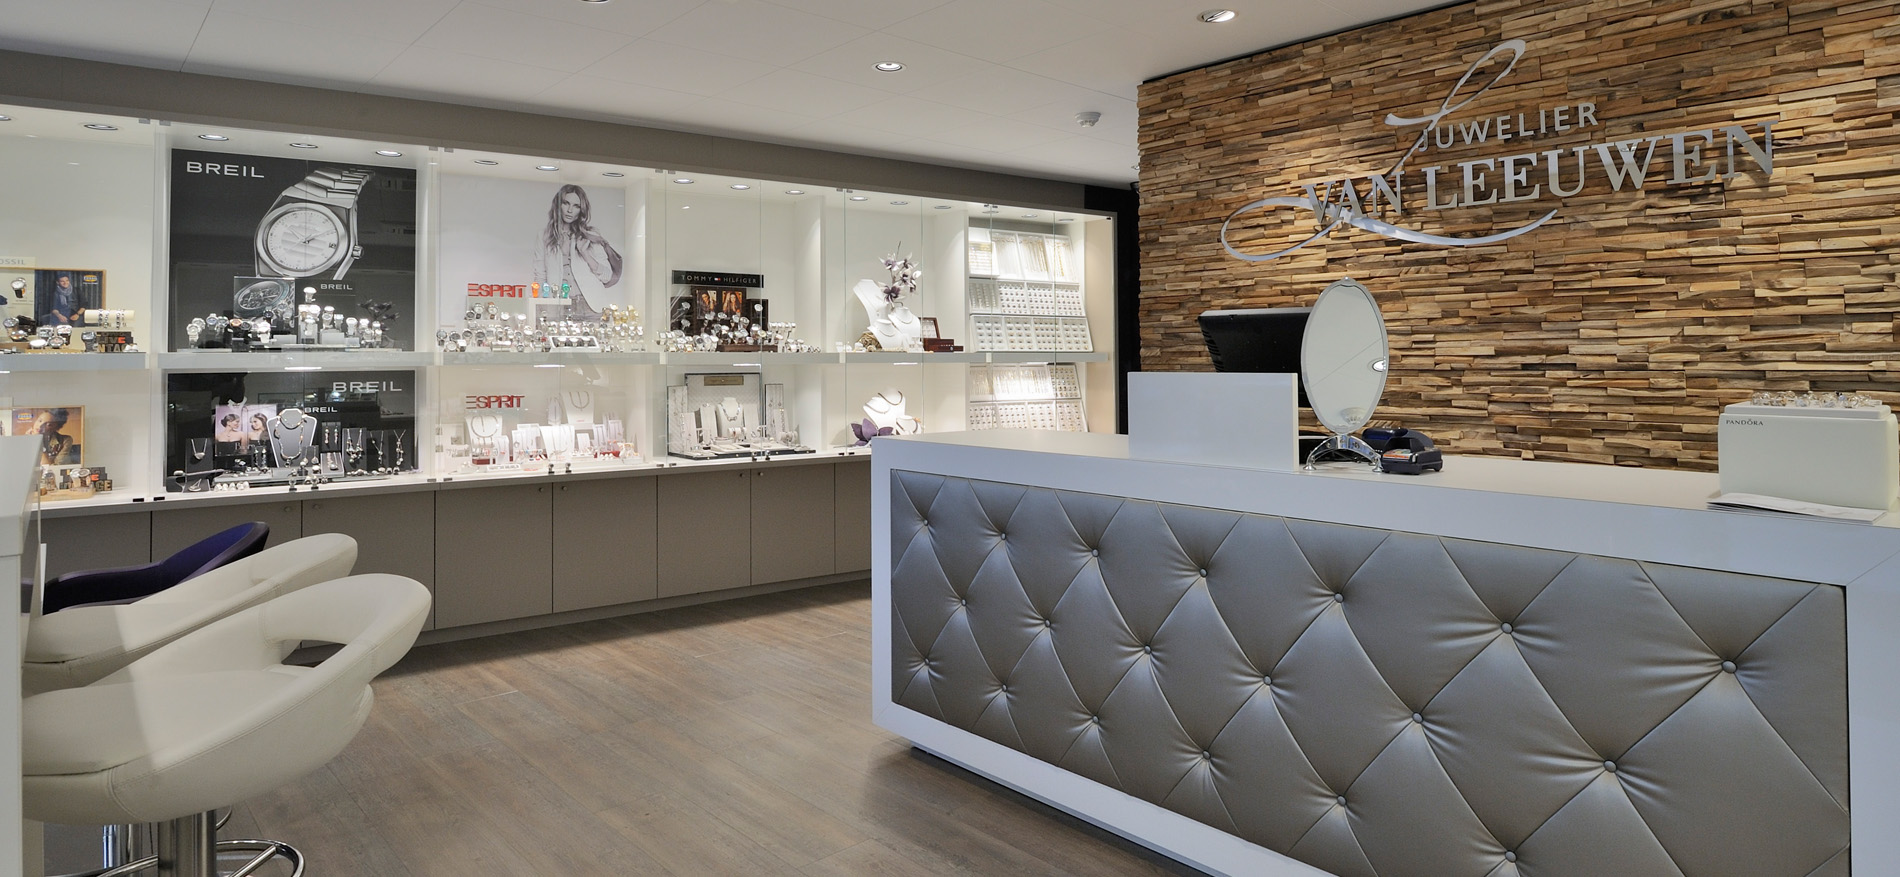 Juwelier van leeuwen dordrecht interieur juwelierszaak for Interieur stylist amsterdam